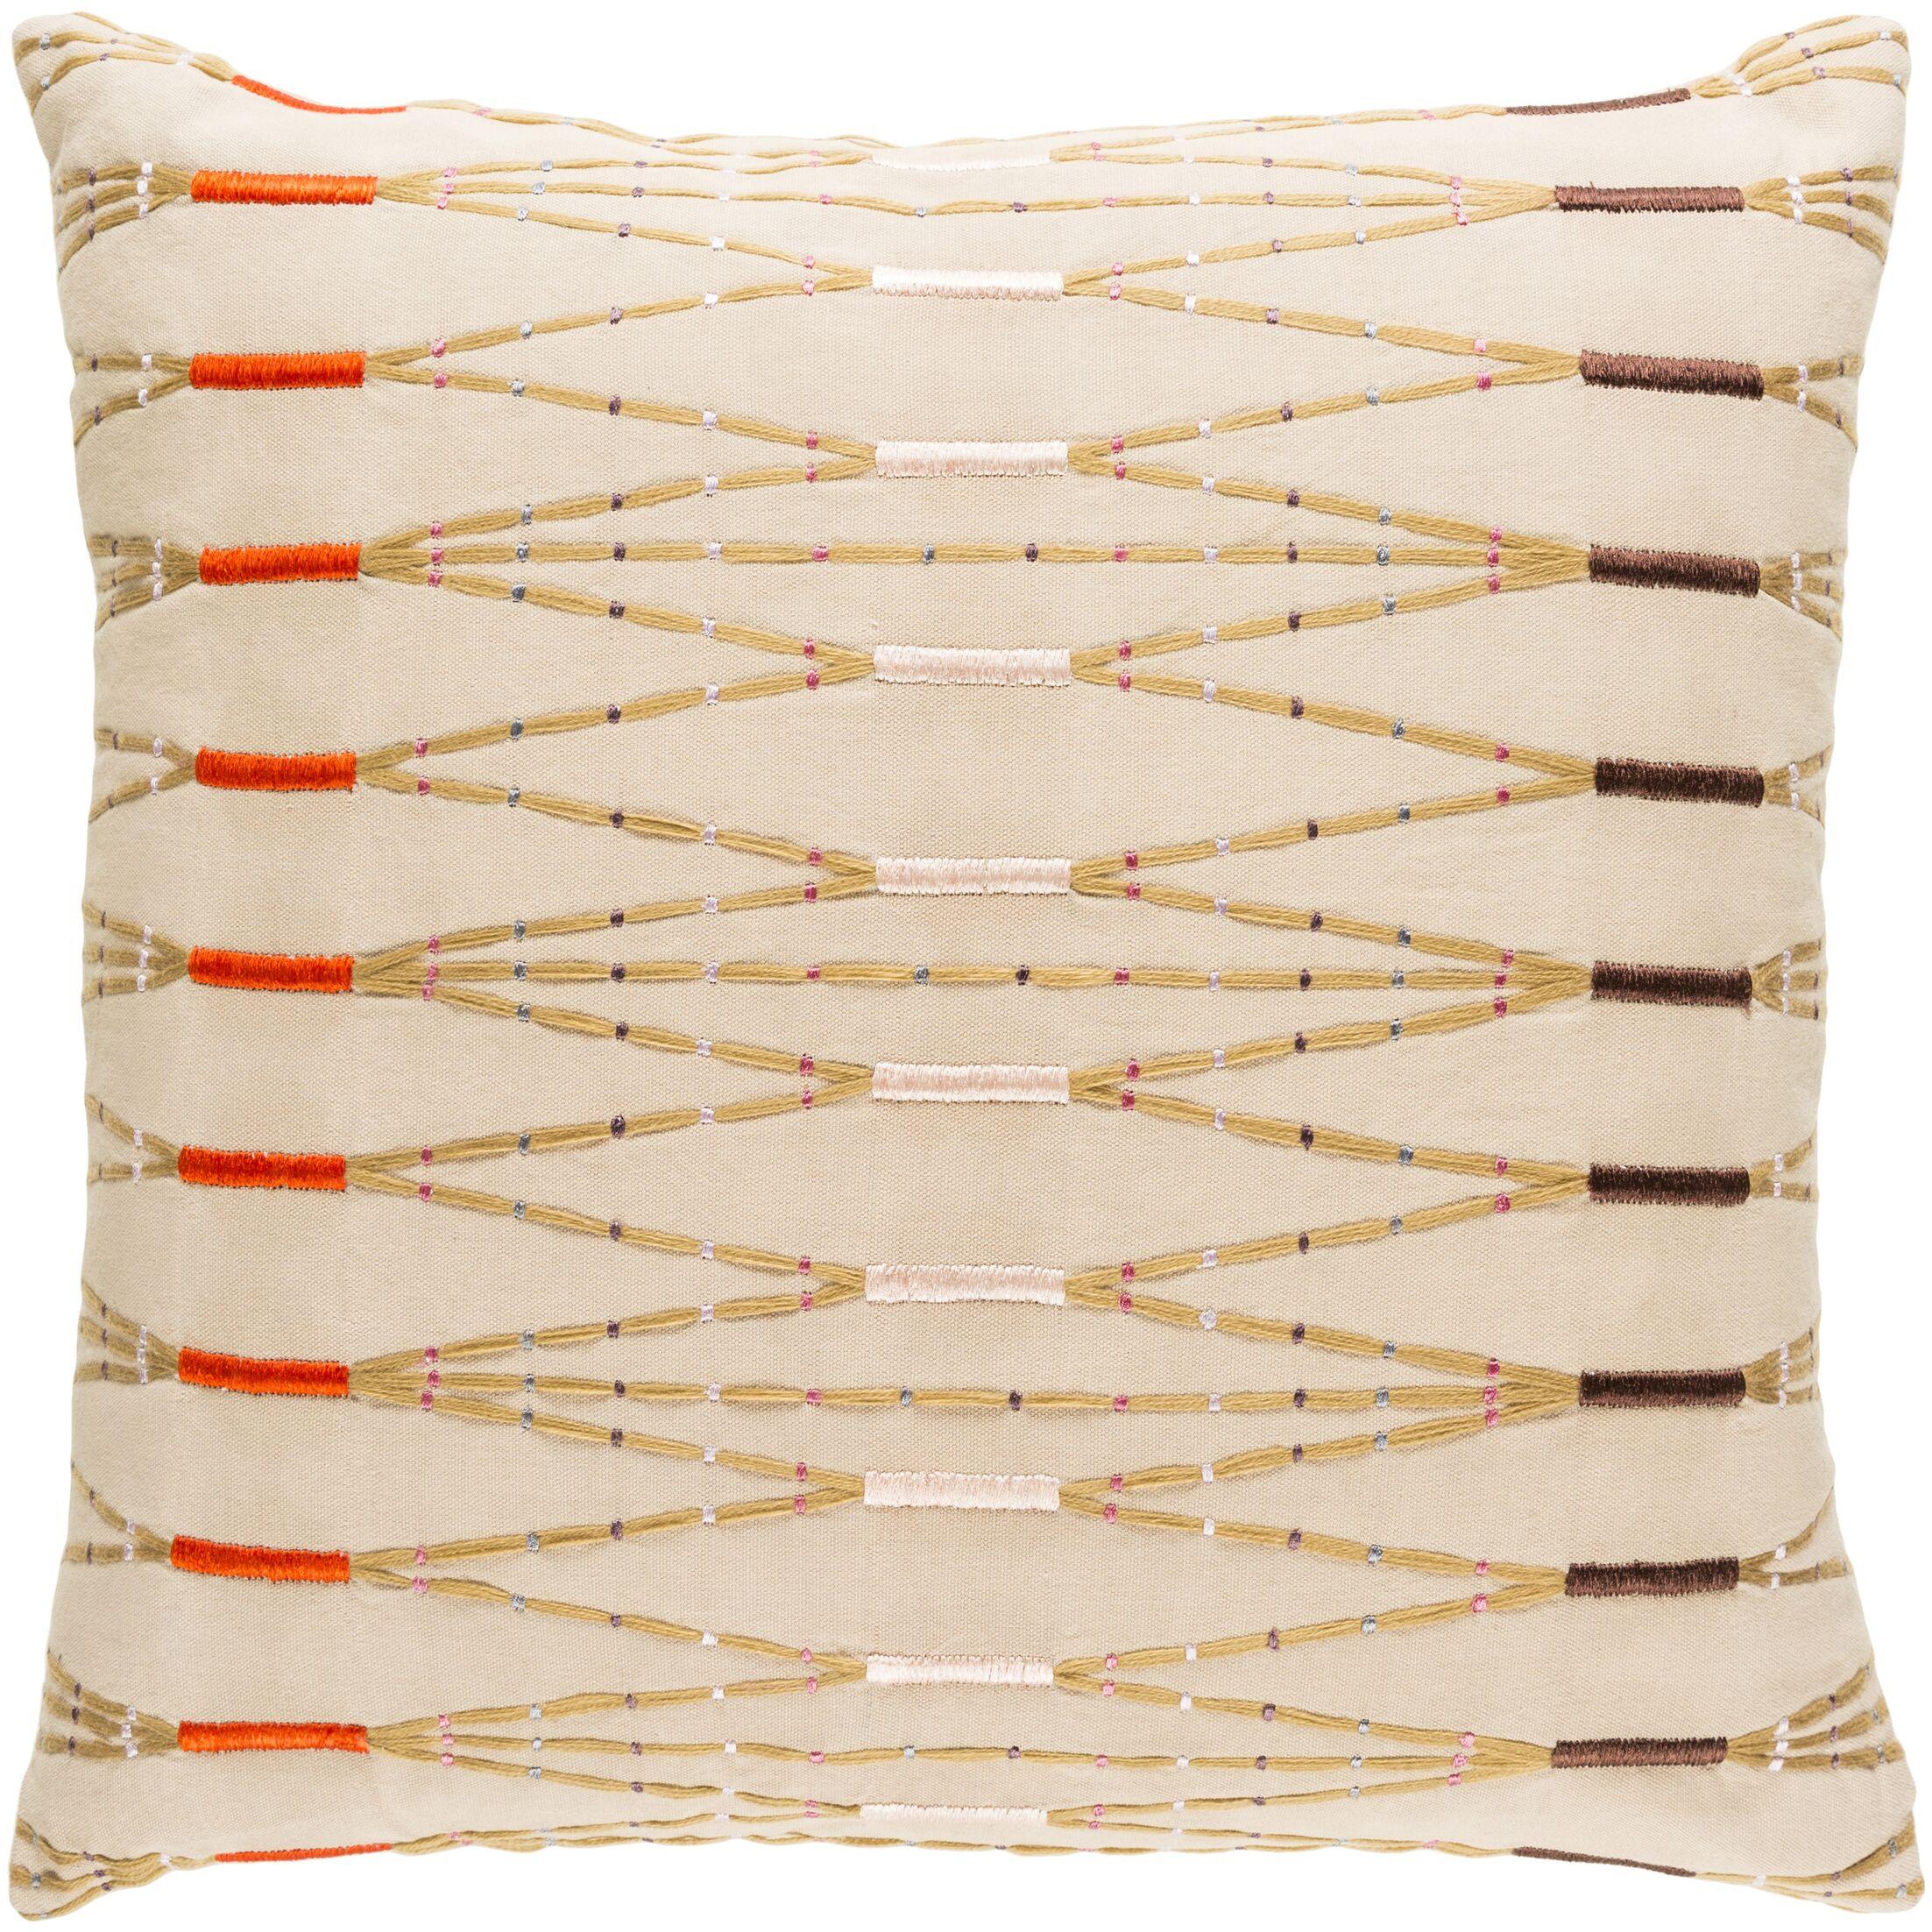 Chiara Cotton Pillow Cover Color: Brown, Size: 20